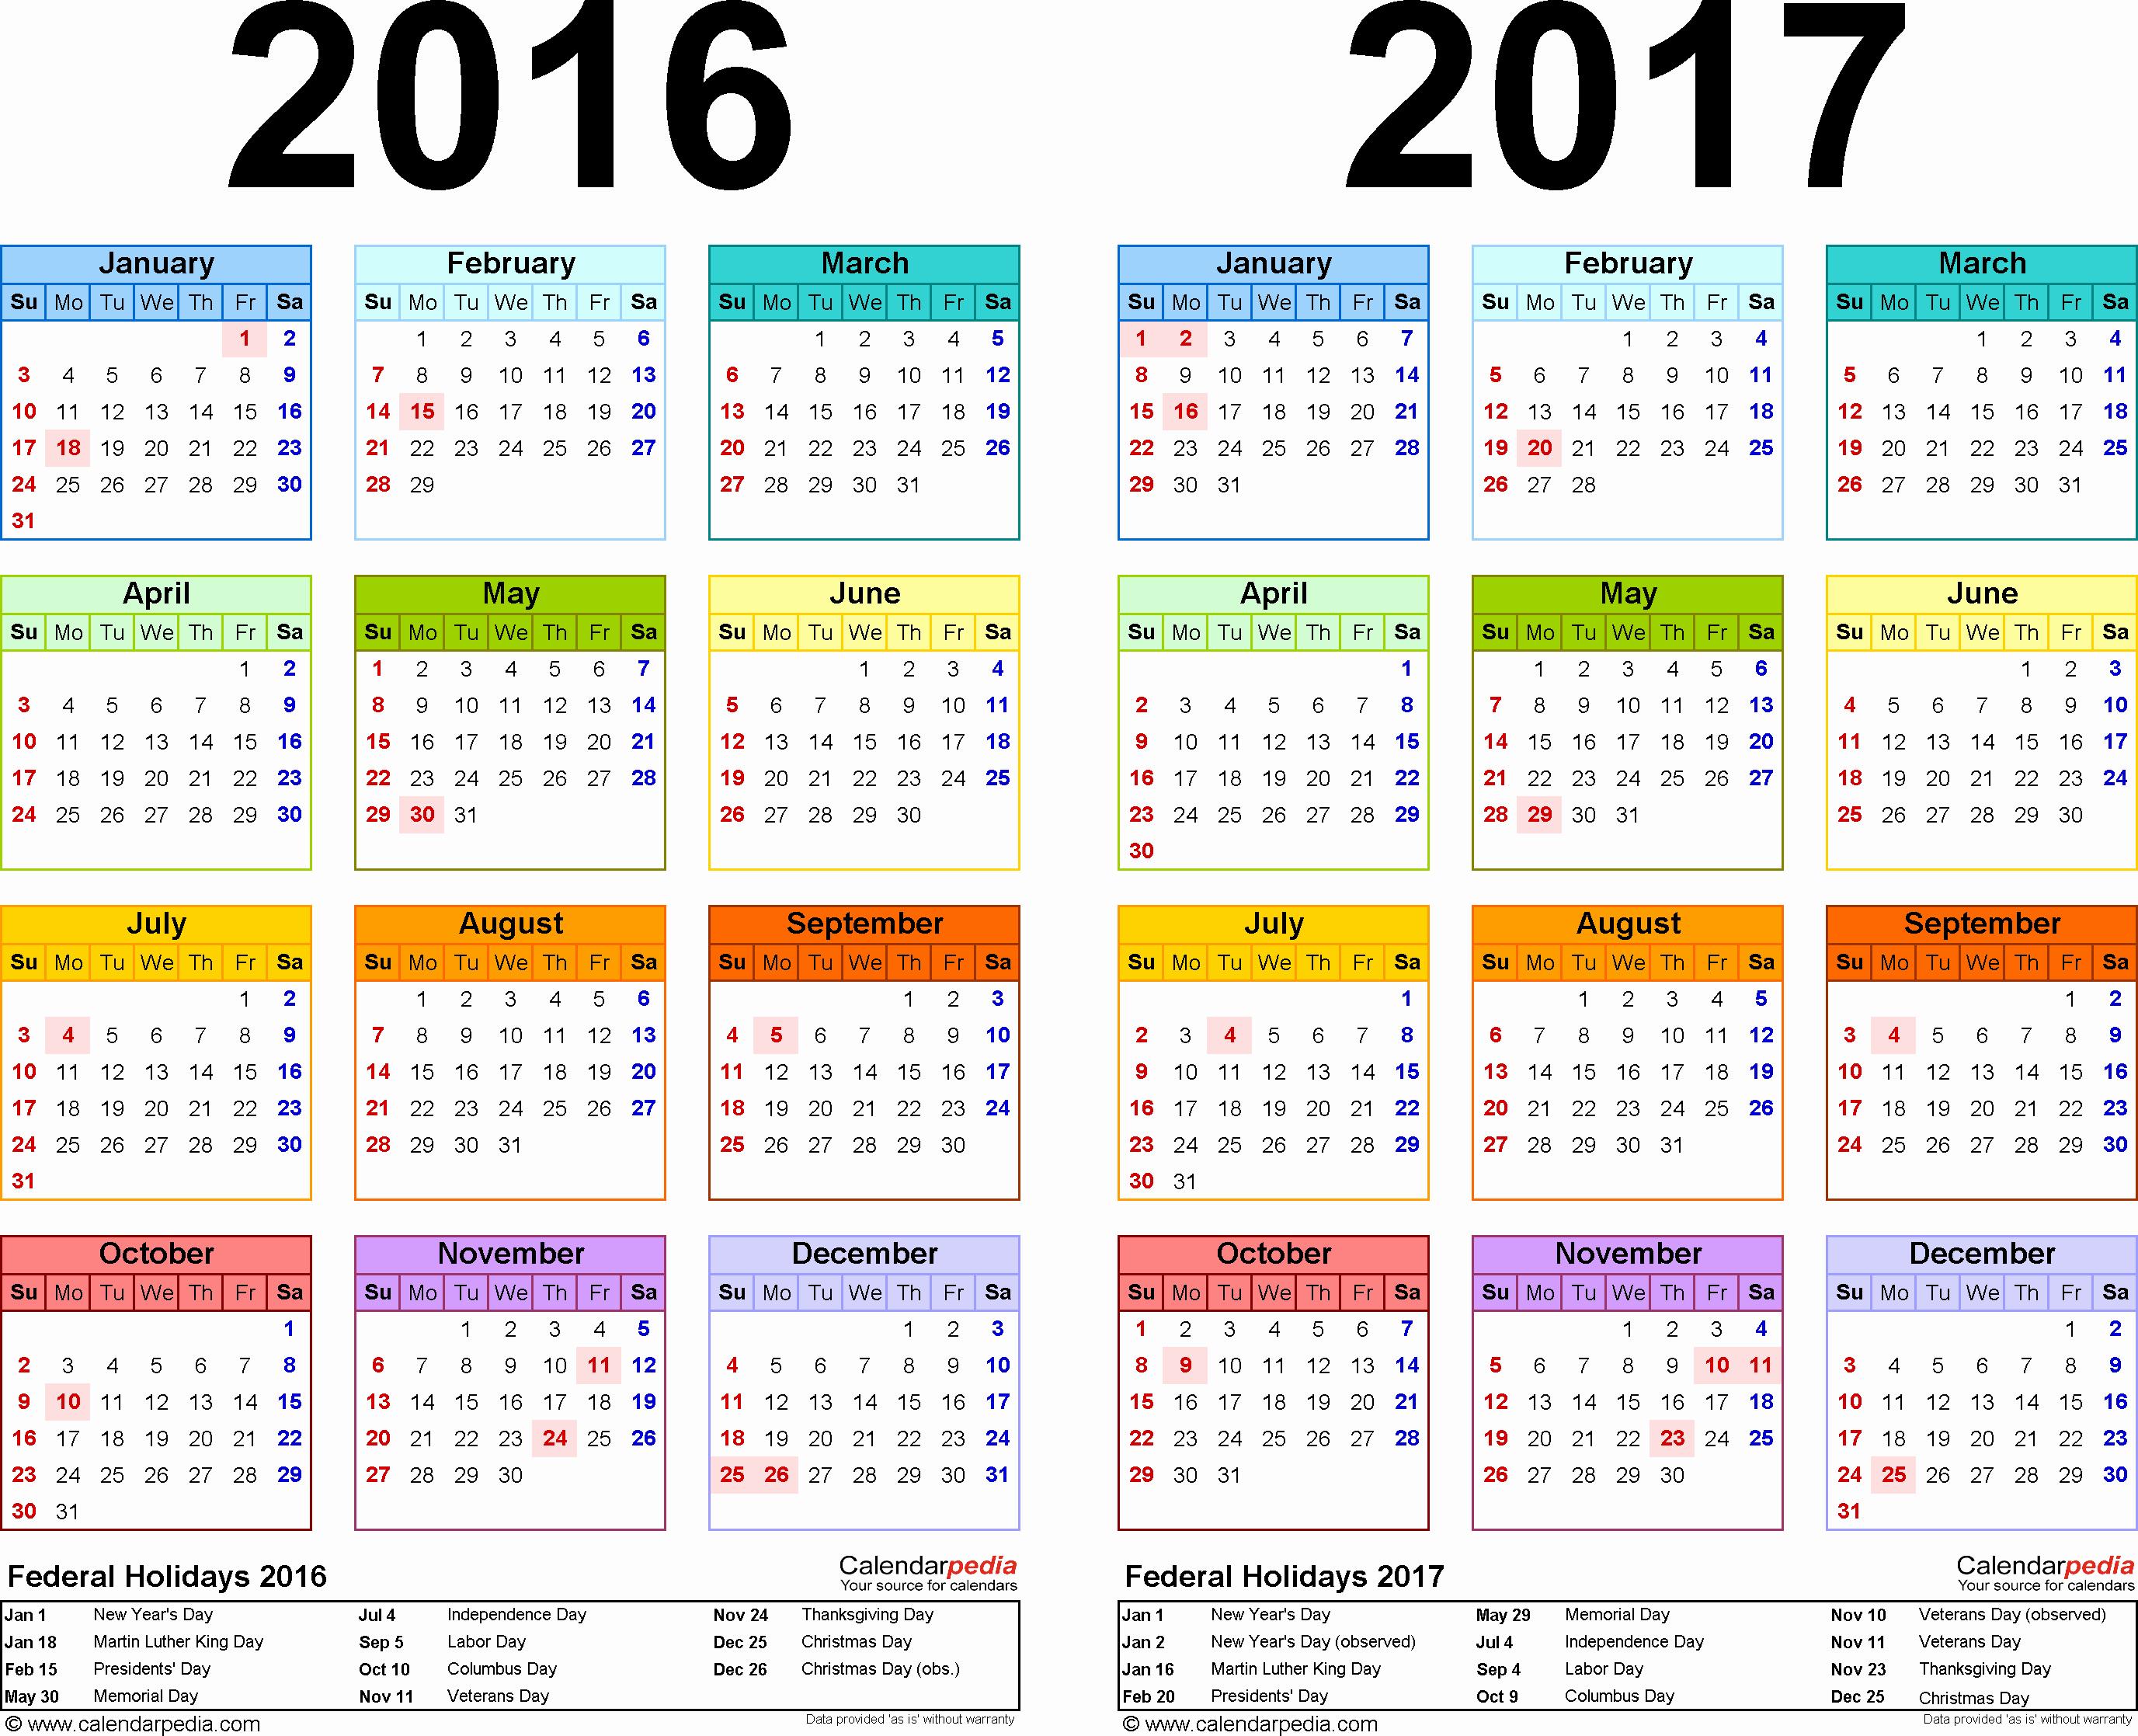 Free Yearly Calendar 2017 Fresh 2016 2017 Calendar Free Printable Two Year Pdf Calendars